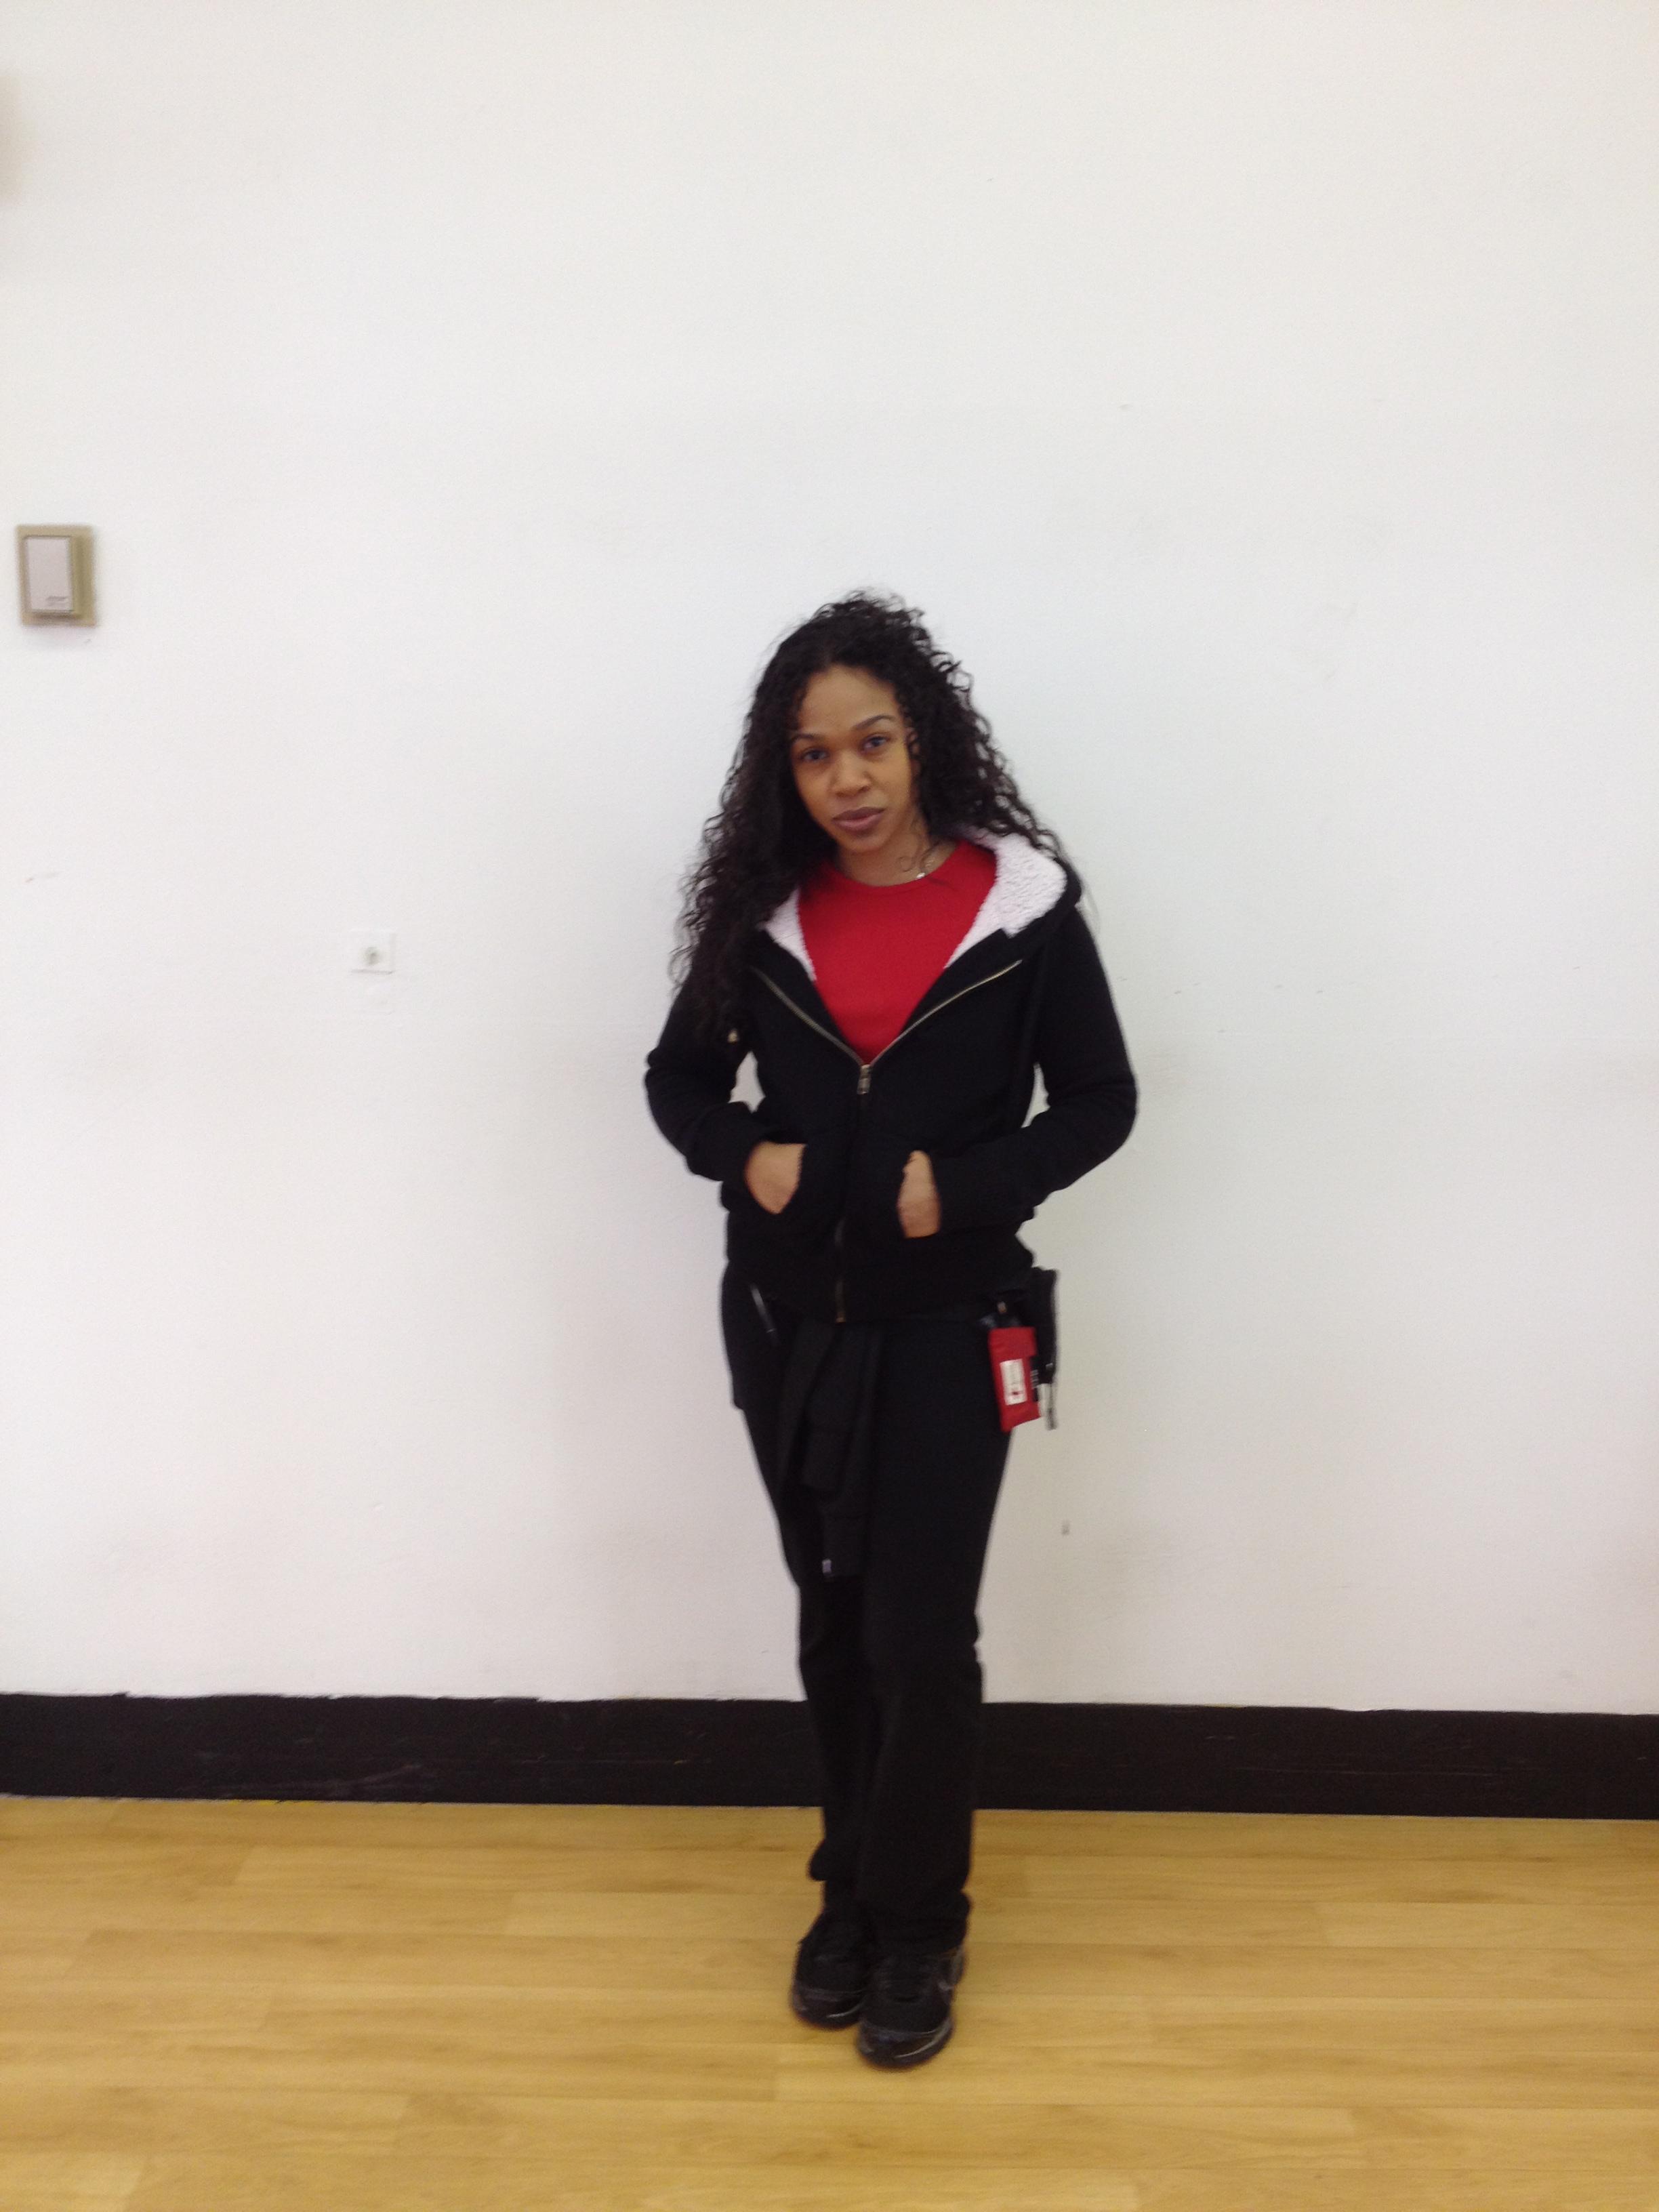 lucille robert 39 s trainer christine nyc single mom. Black Bedroom Furniture Sets. Home Design Ideas